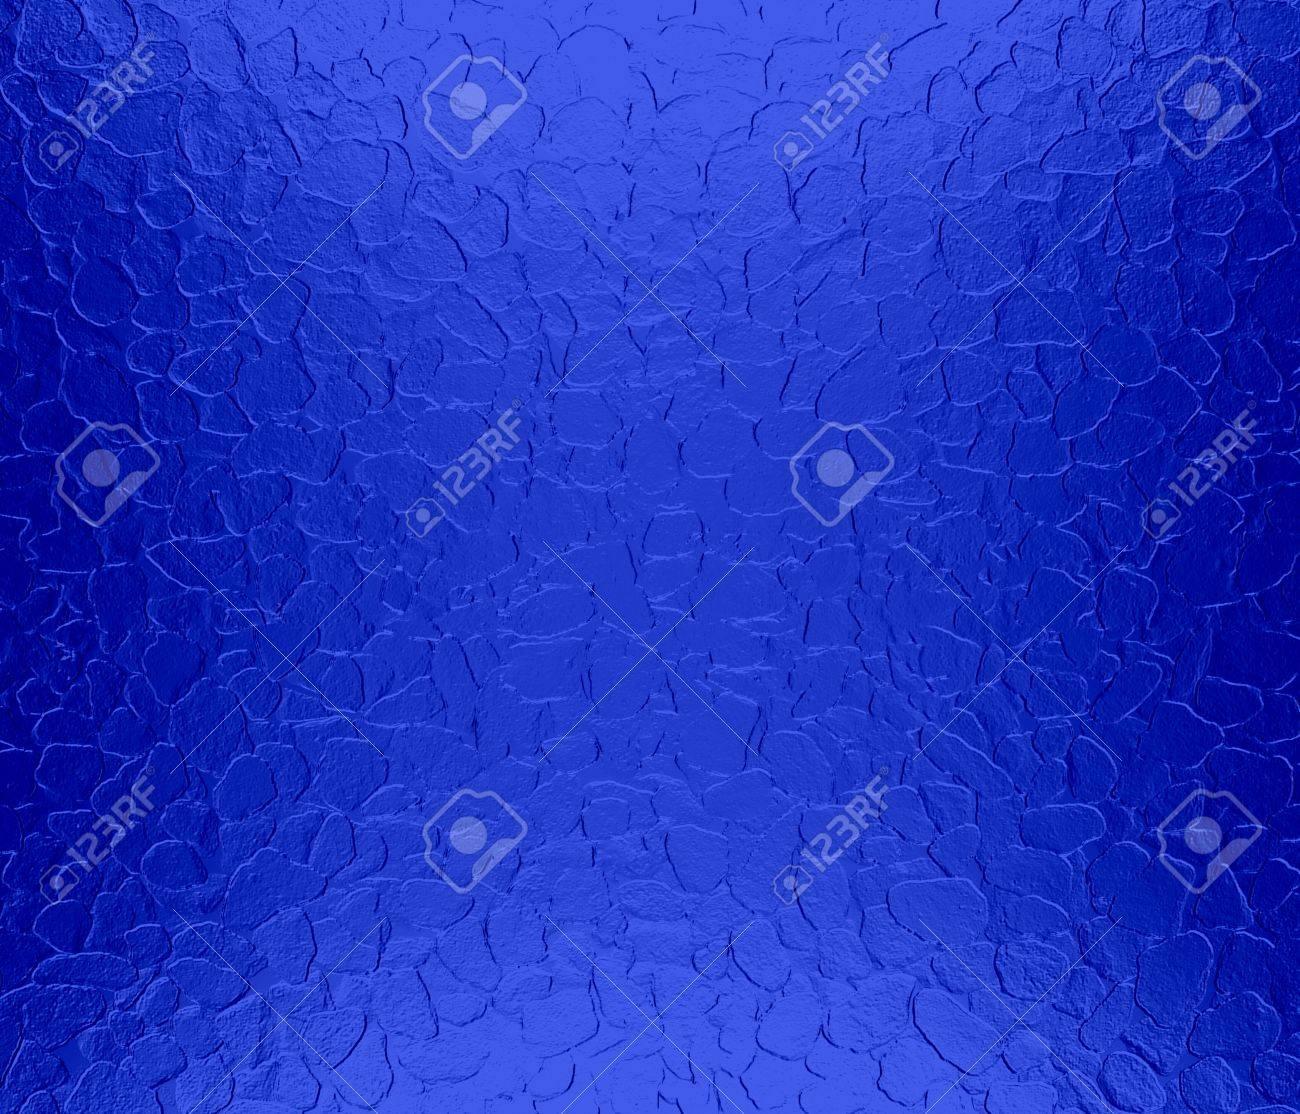 Bleu Pantone Texture Métallique De Métal Fond